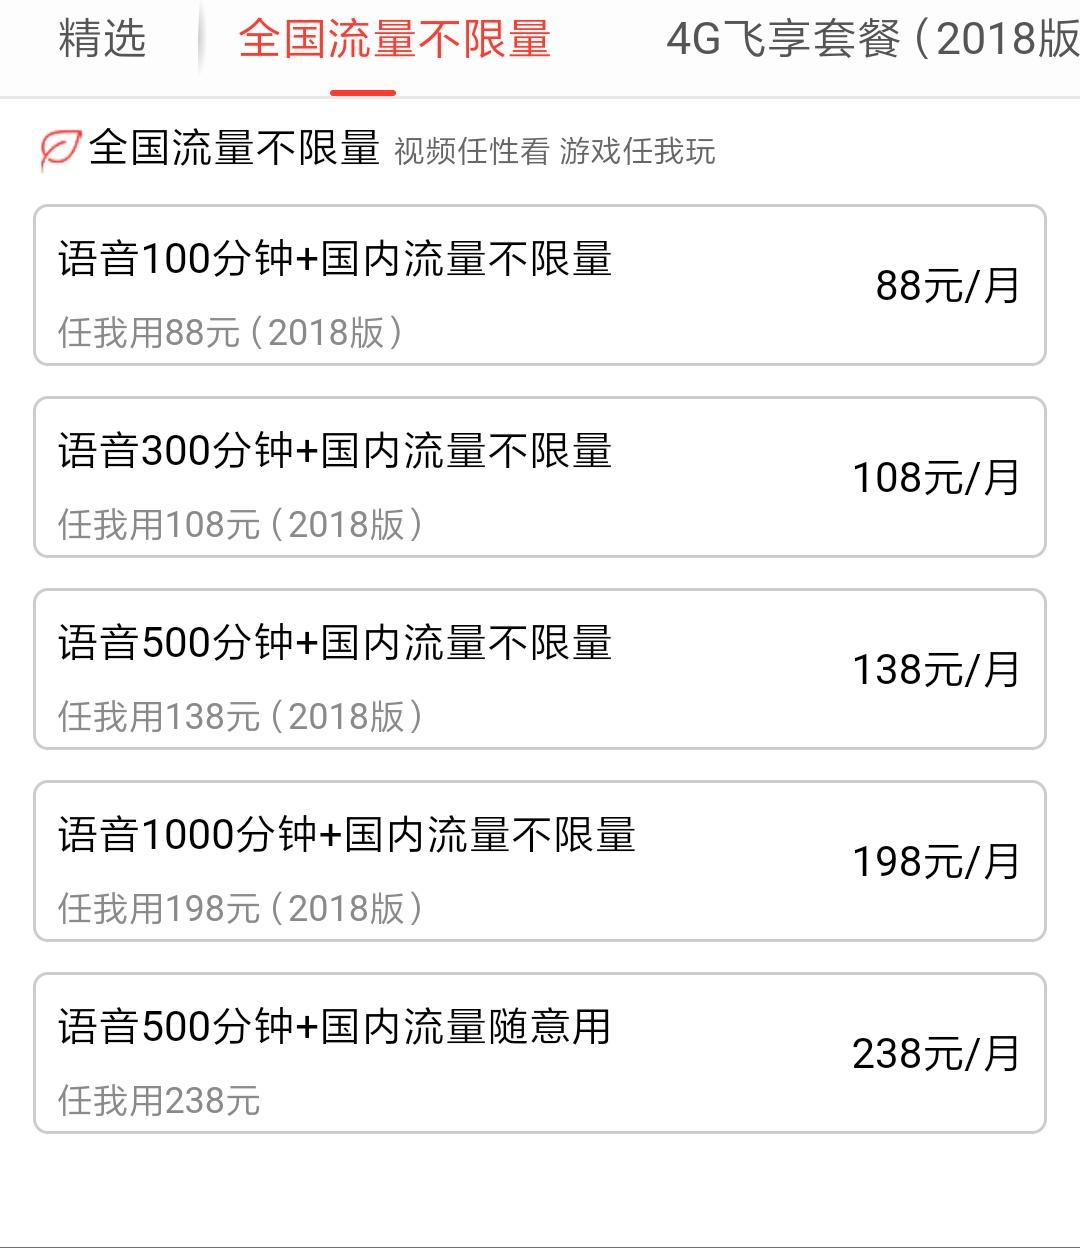 Screenshot_2018-06-11-01-25-32-794_com.sitech.ac.png